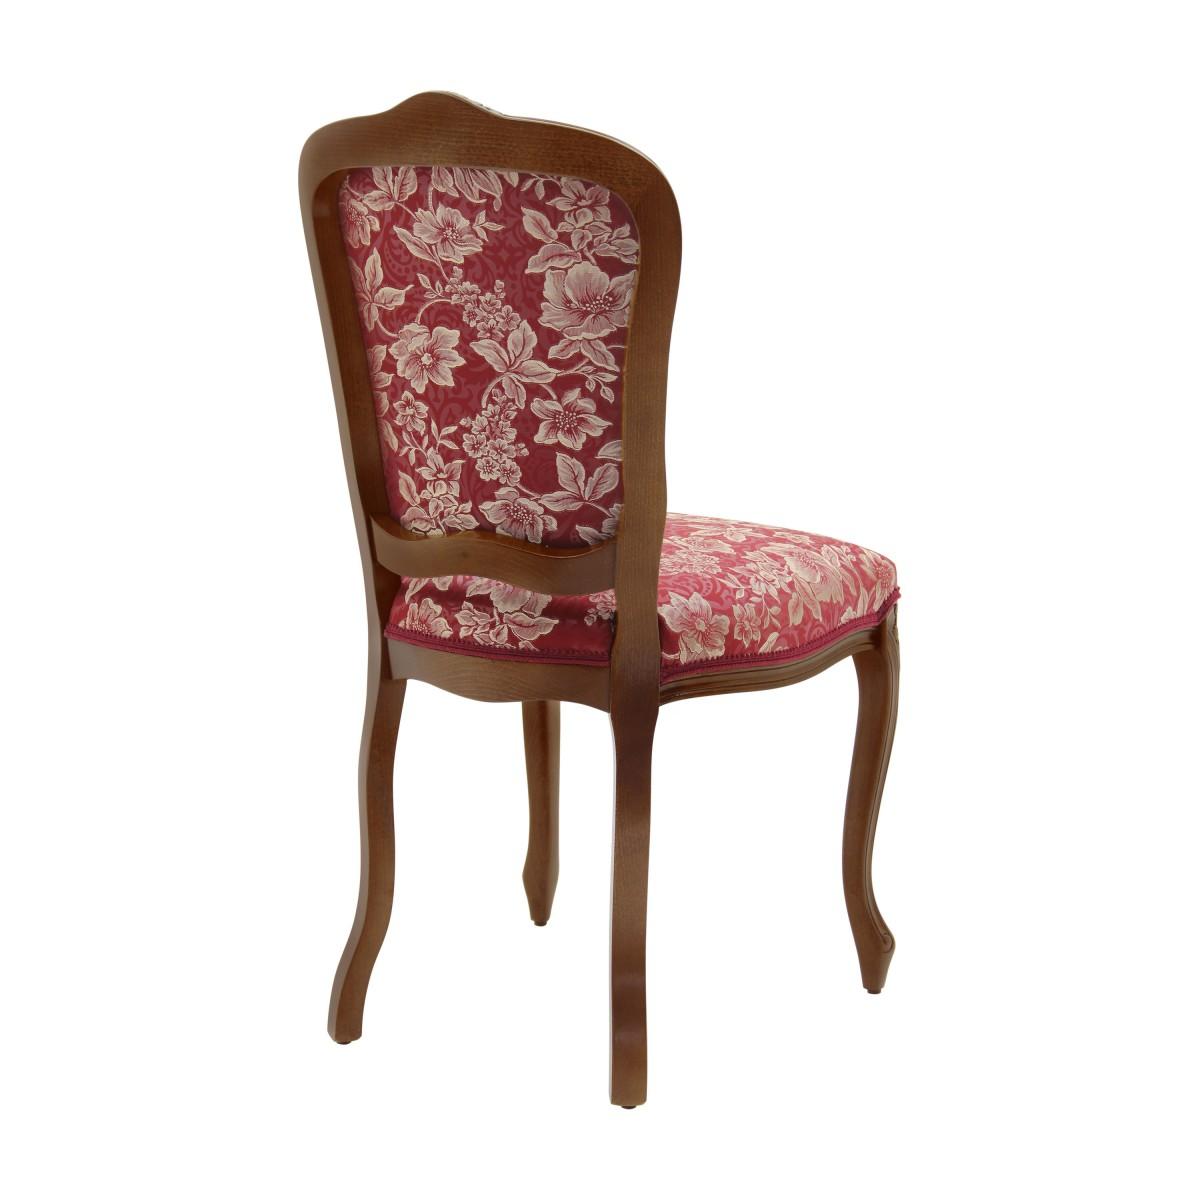 Chair Fiorino - Sevensedie